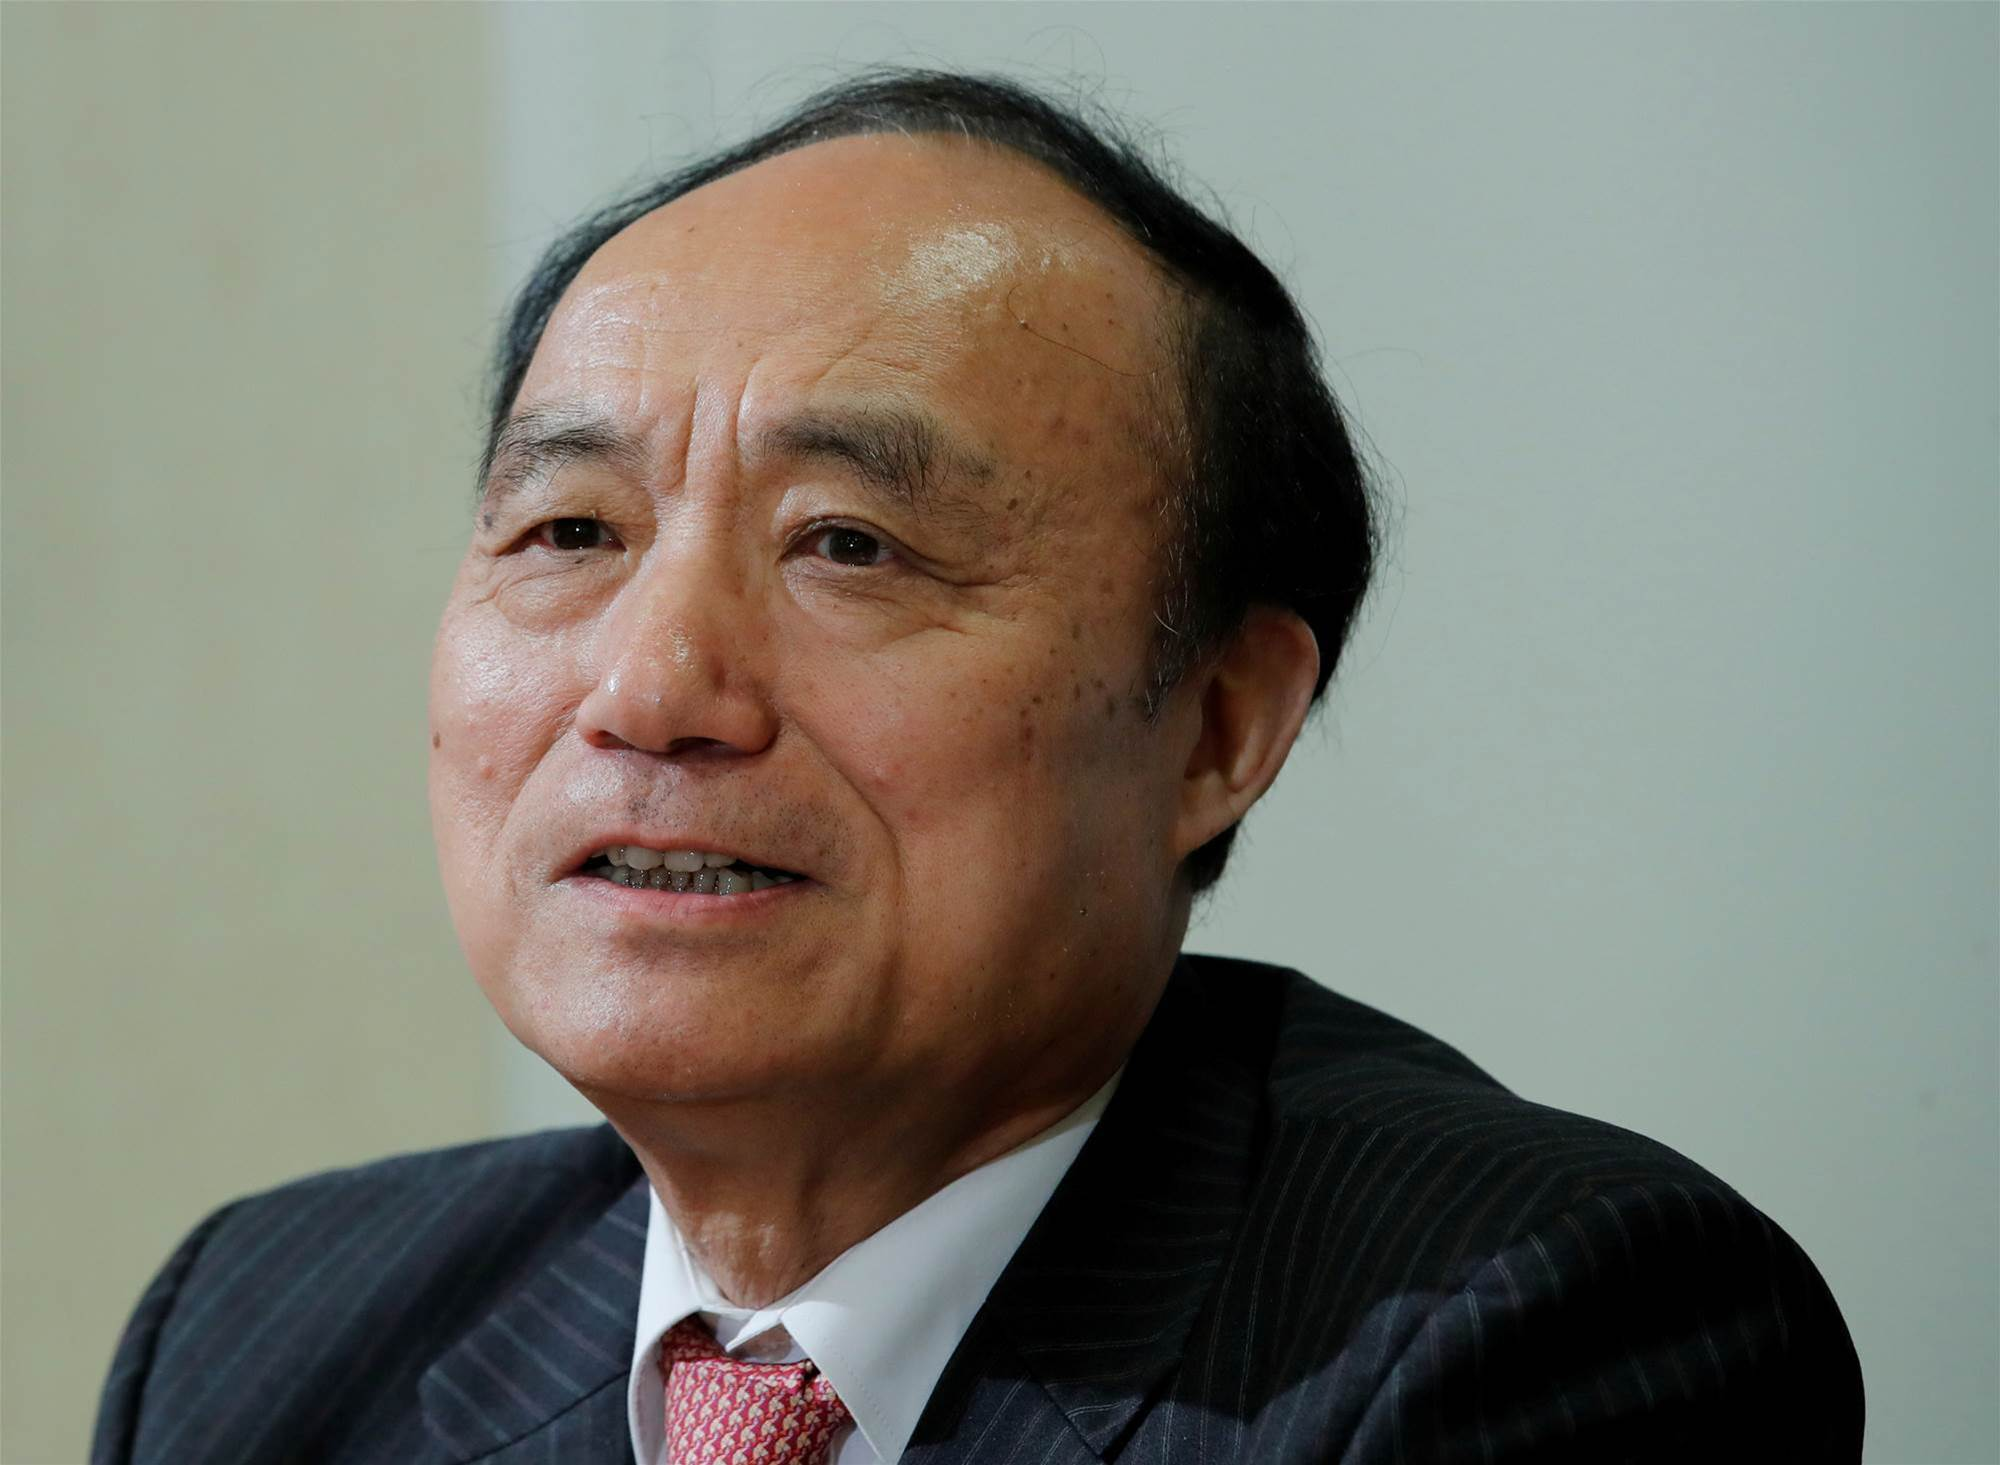 UN official says Huawei a victim of politics